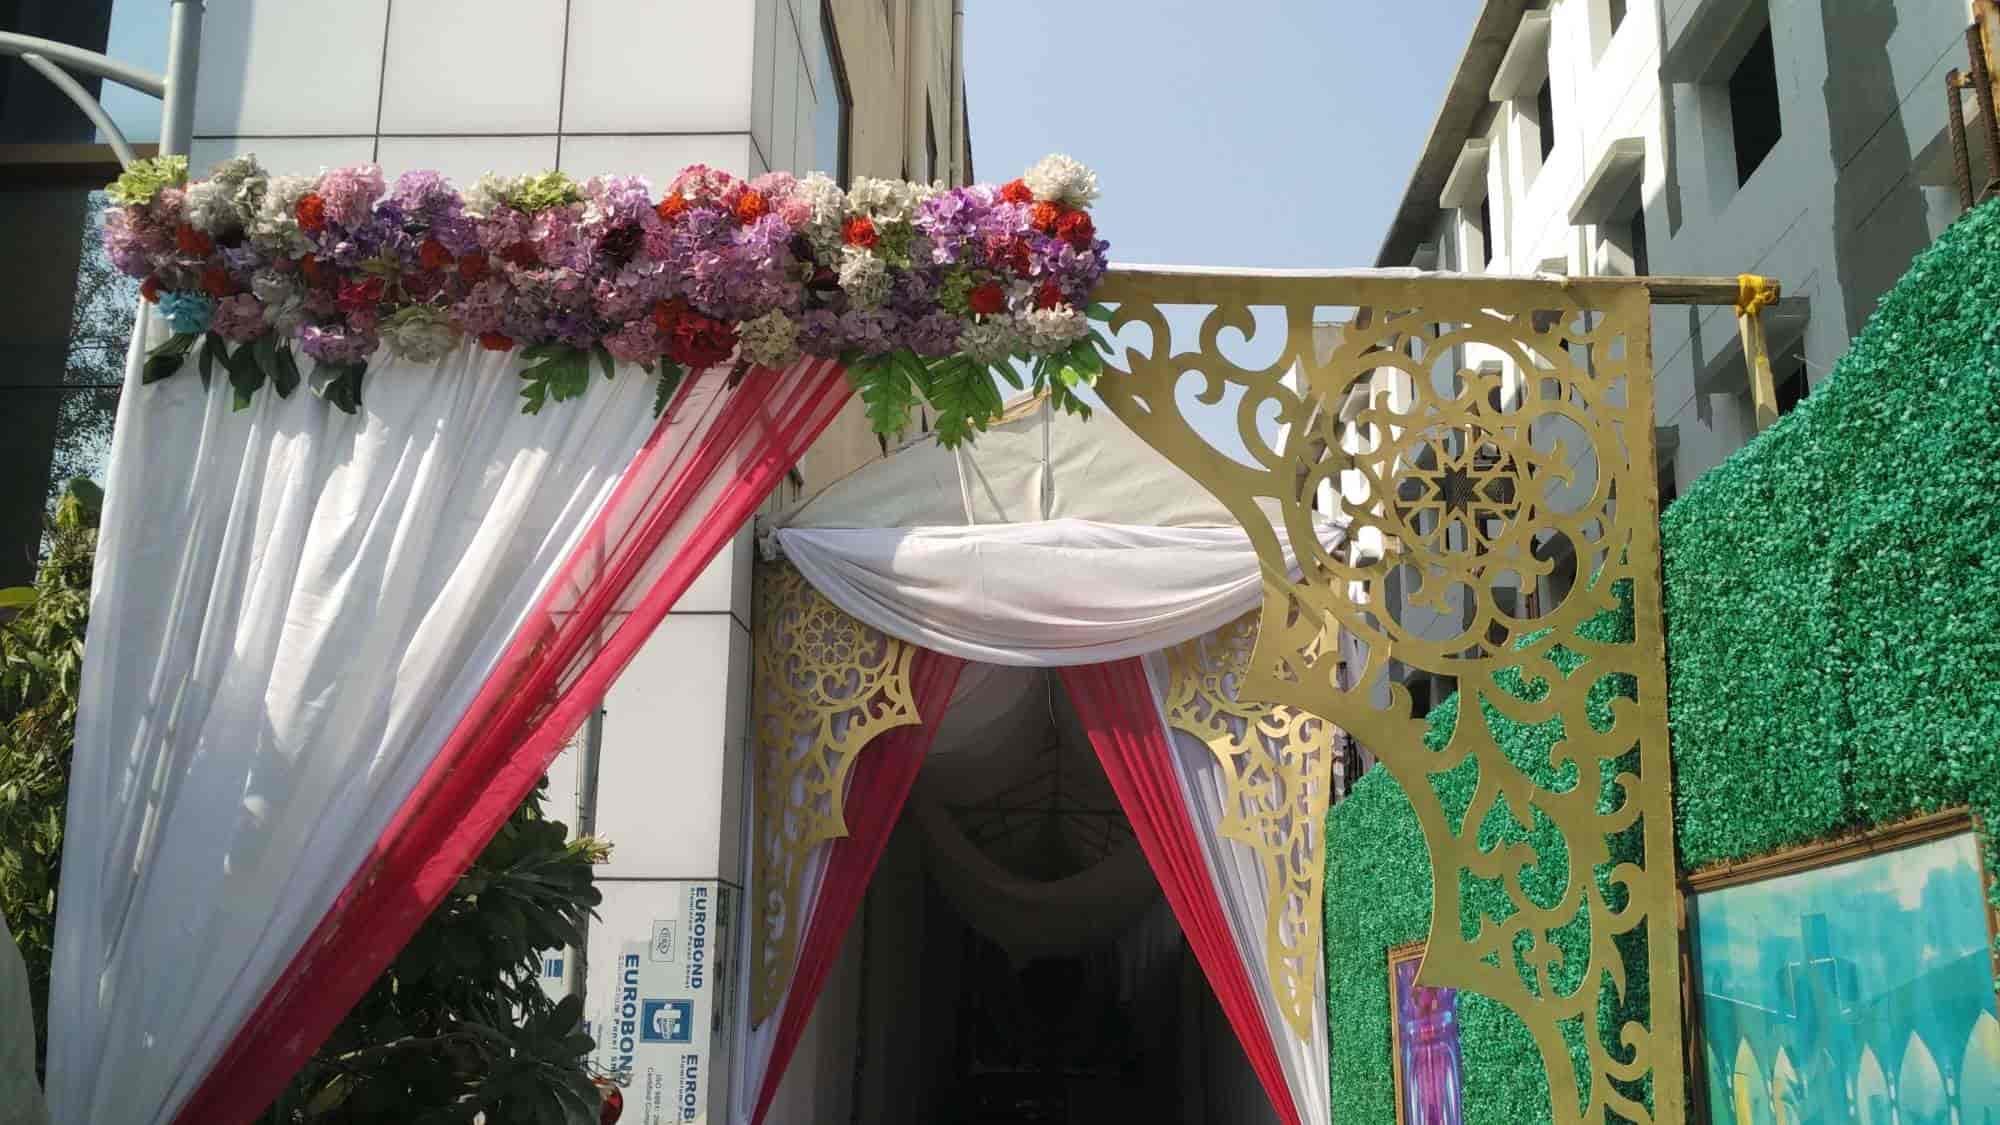 Subhmangalam wedding and event organiser photos maligaon chariali entrance gate decoration for wedding subhmangalam wedding and event organiser photos maligaon chariali junglespirit Choice Image